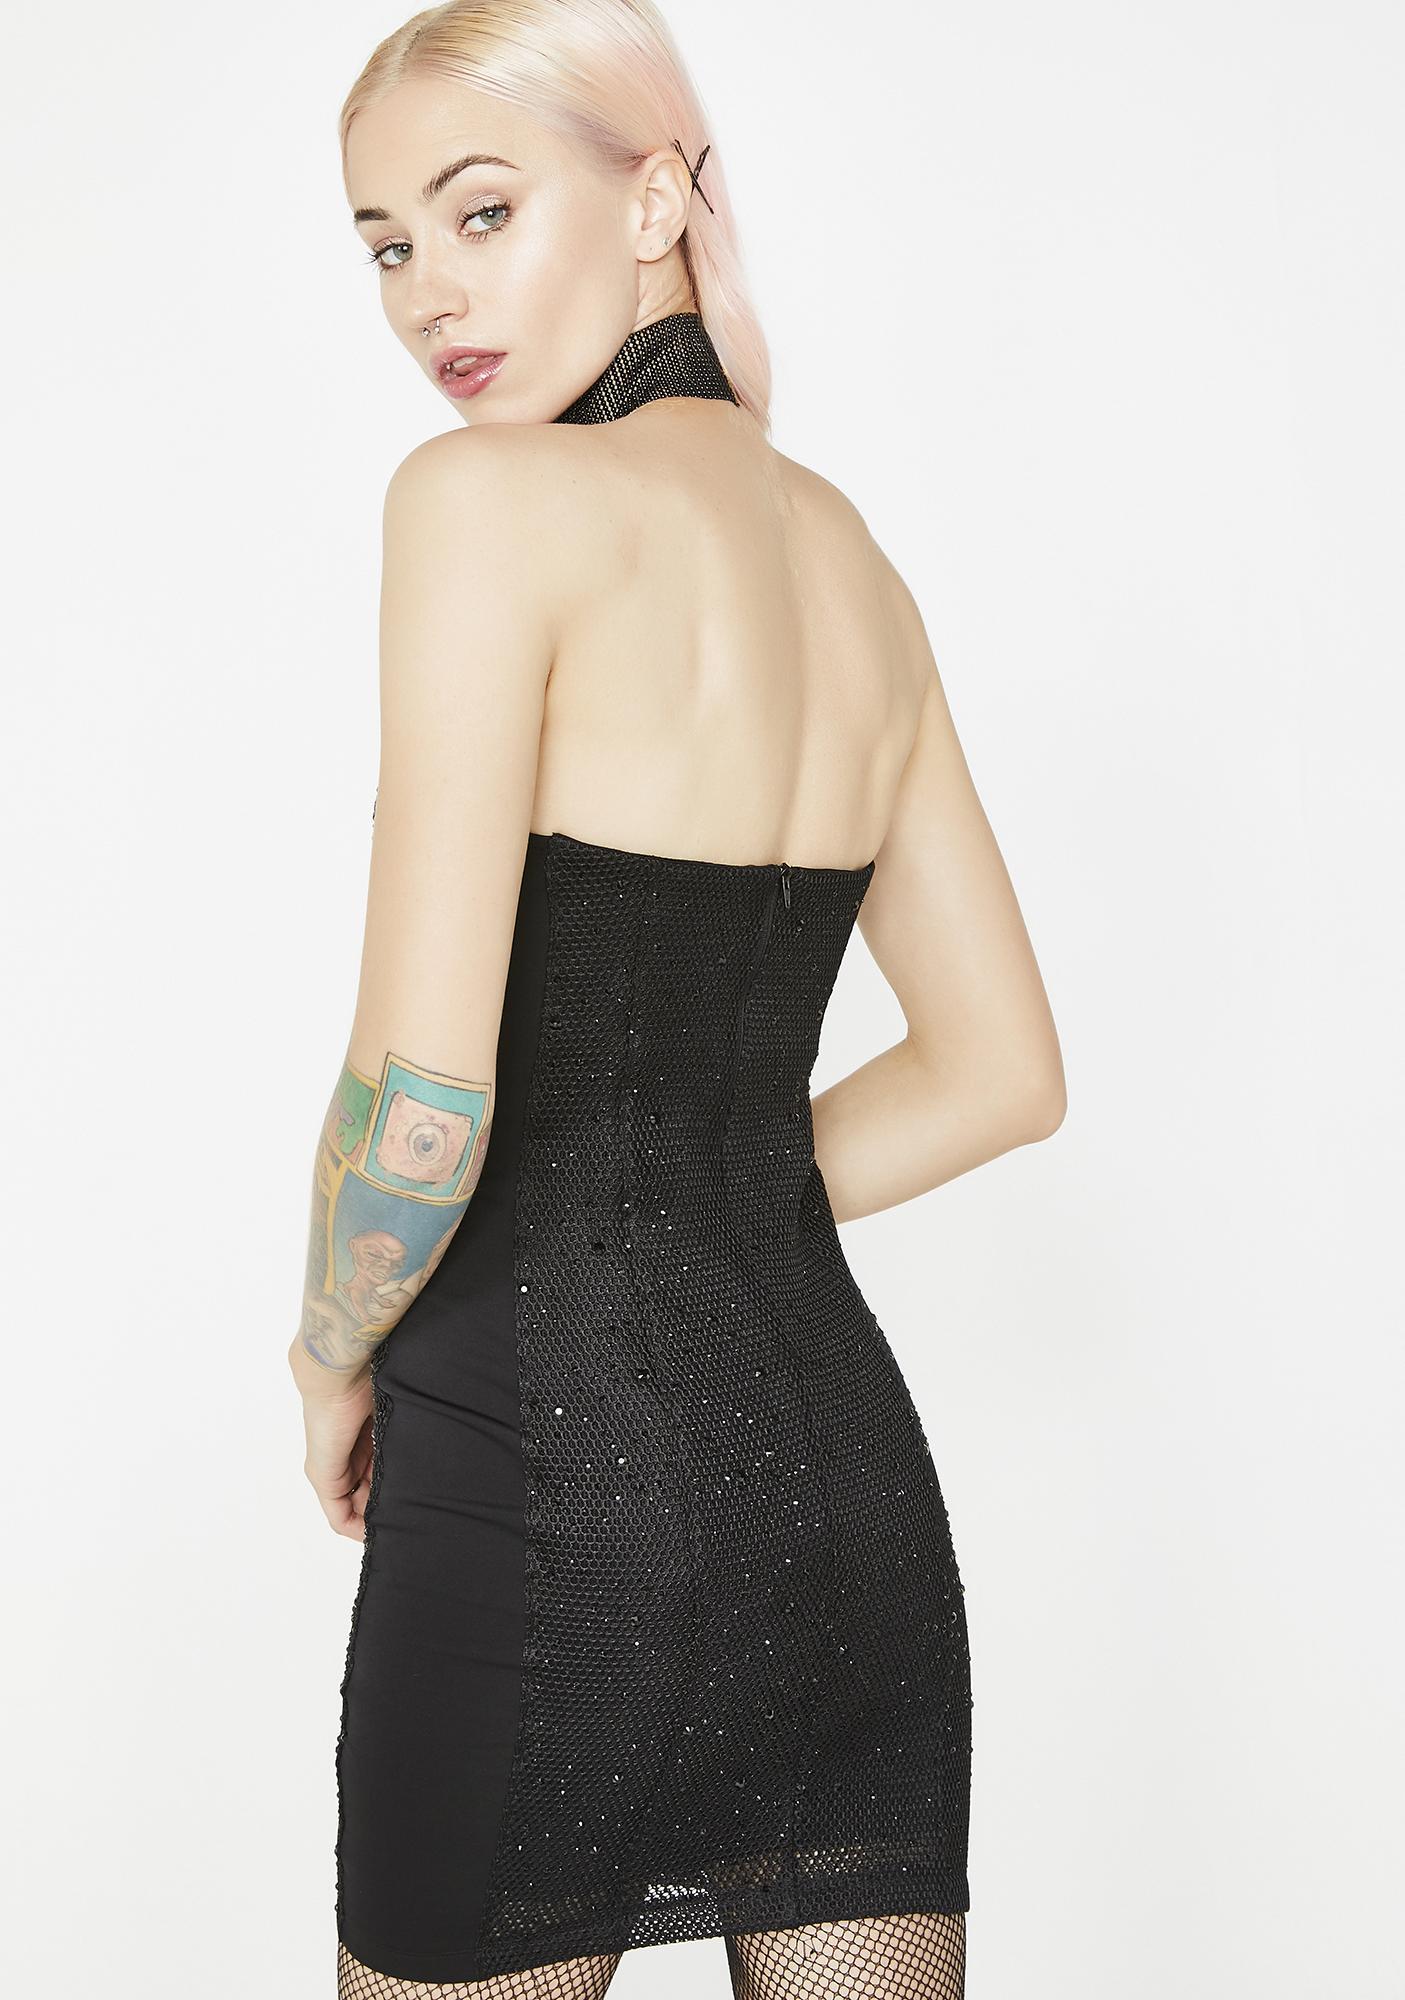 Kiki Riki Charming Chick Mini Dress